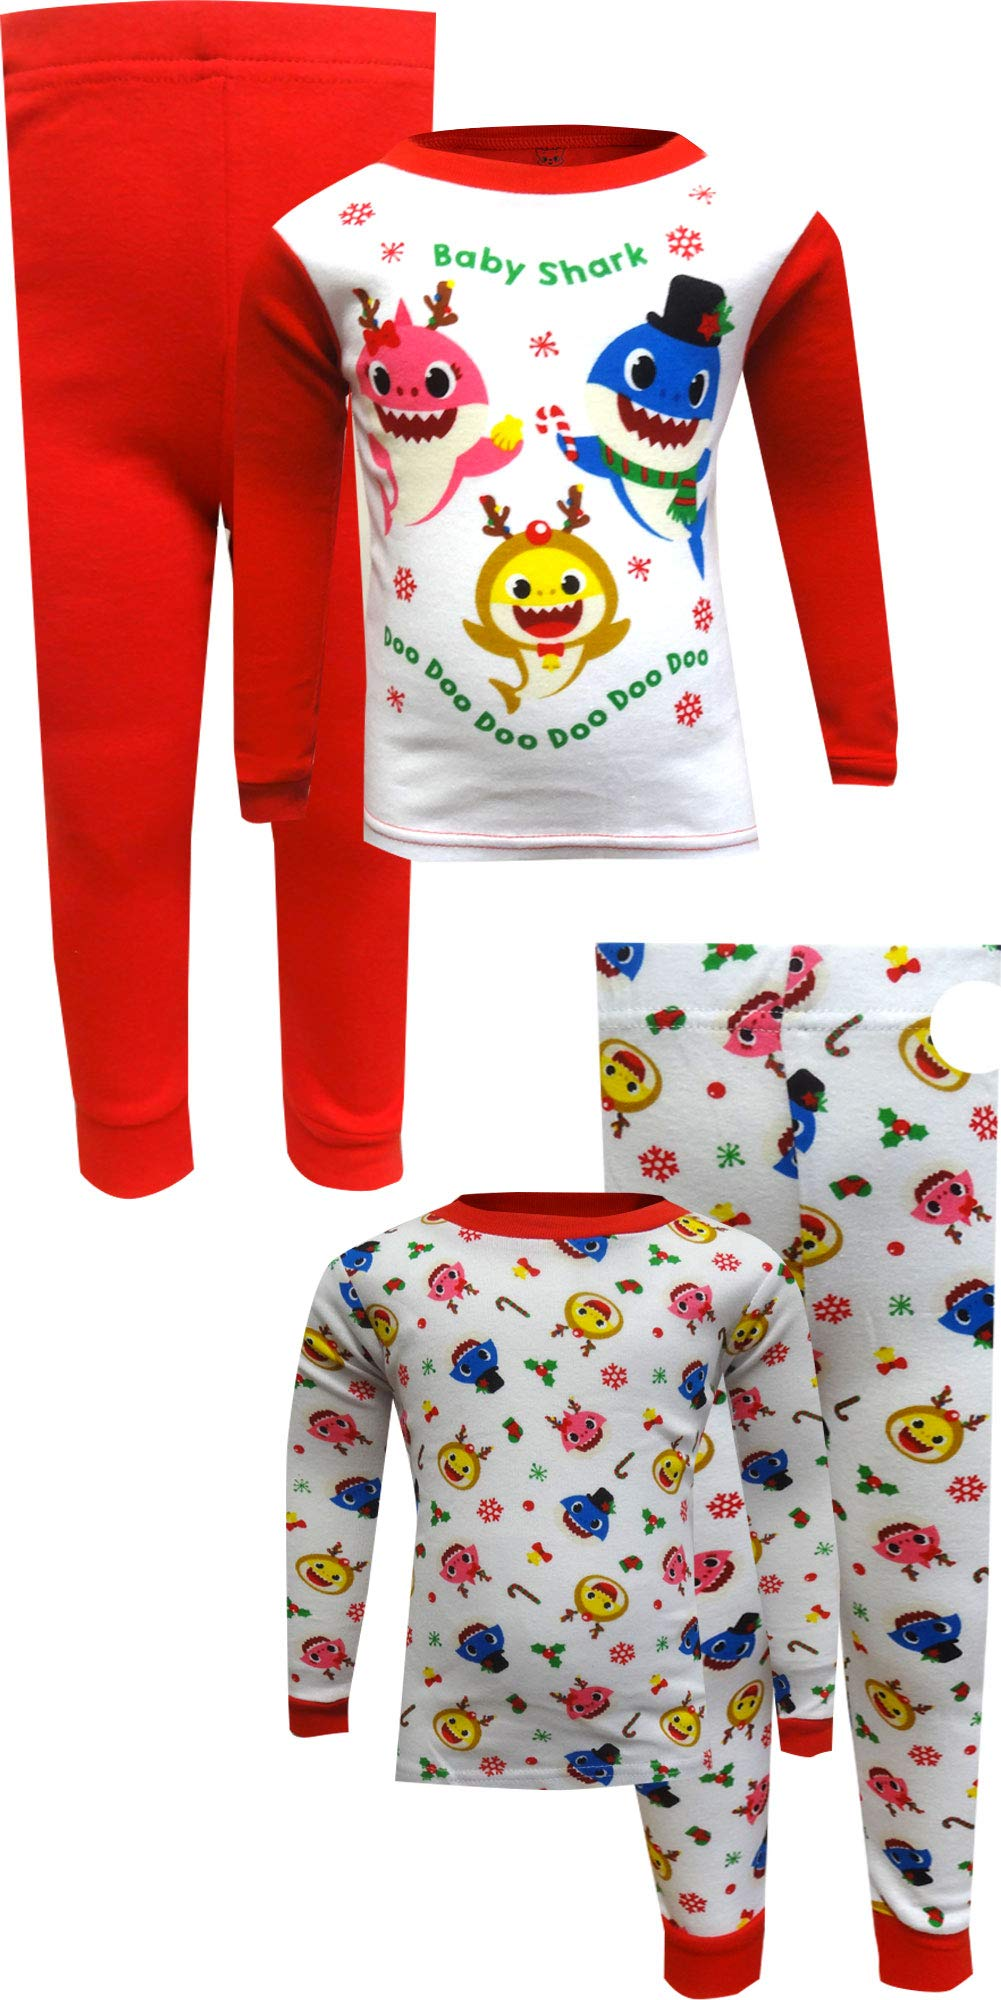 Baby Shark Boys' Toddler 4-Piece Cotton Pajama Set, Holiday Sharks, 2T by Baby Shark